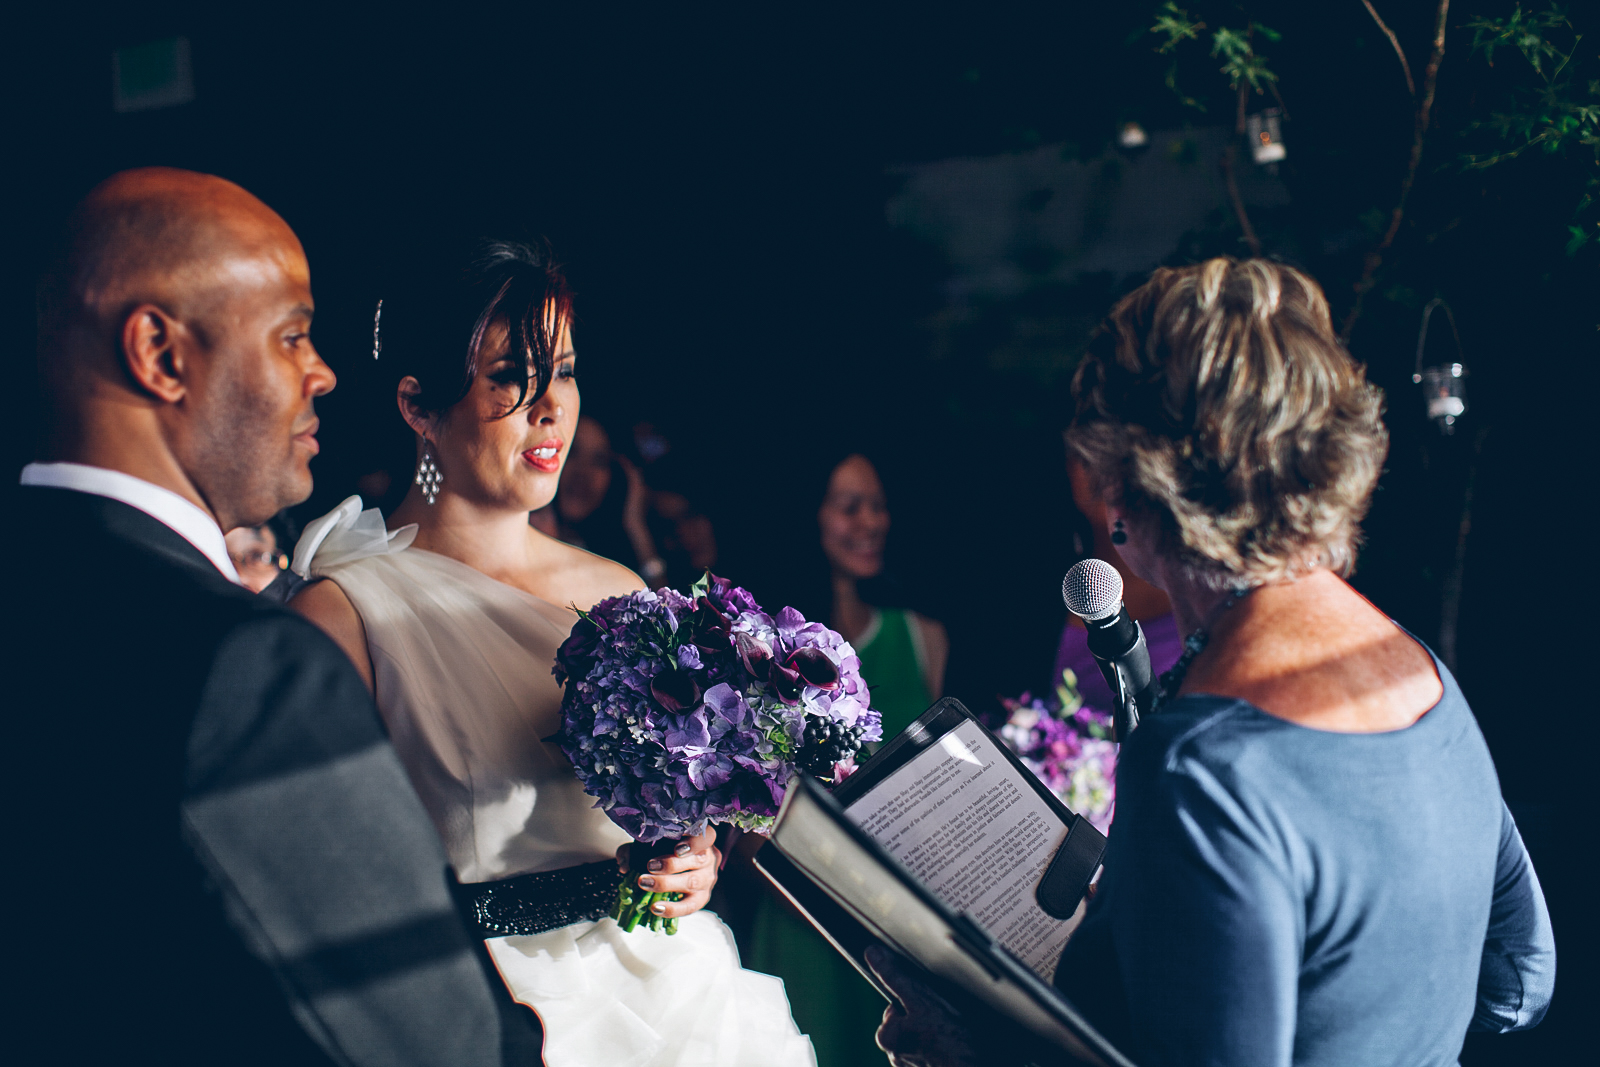 greens_restaurant_wedding_photography_san_franscisco_ebony_siovhan_bokeh_photography_37.jpg